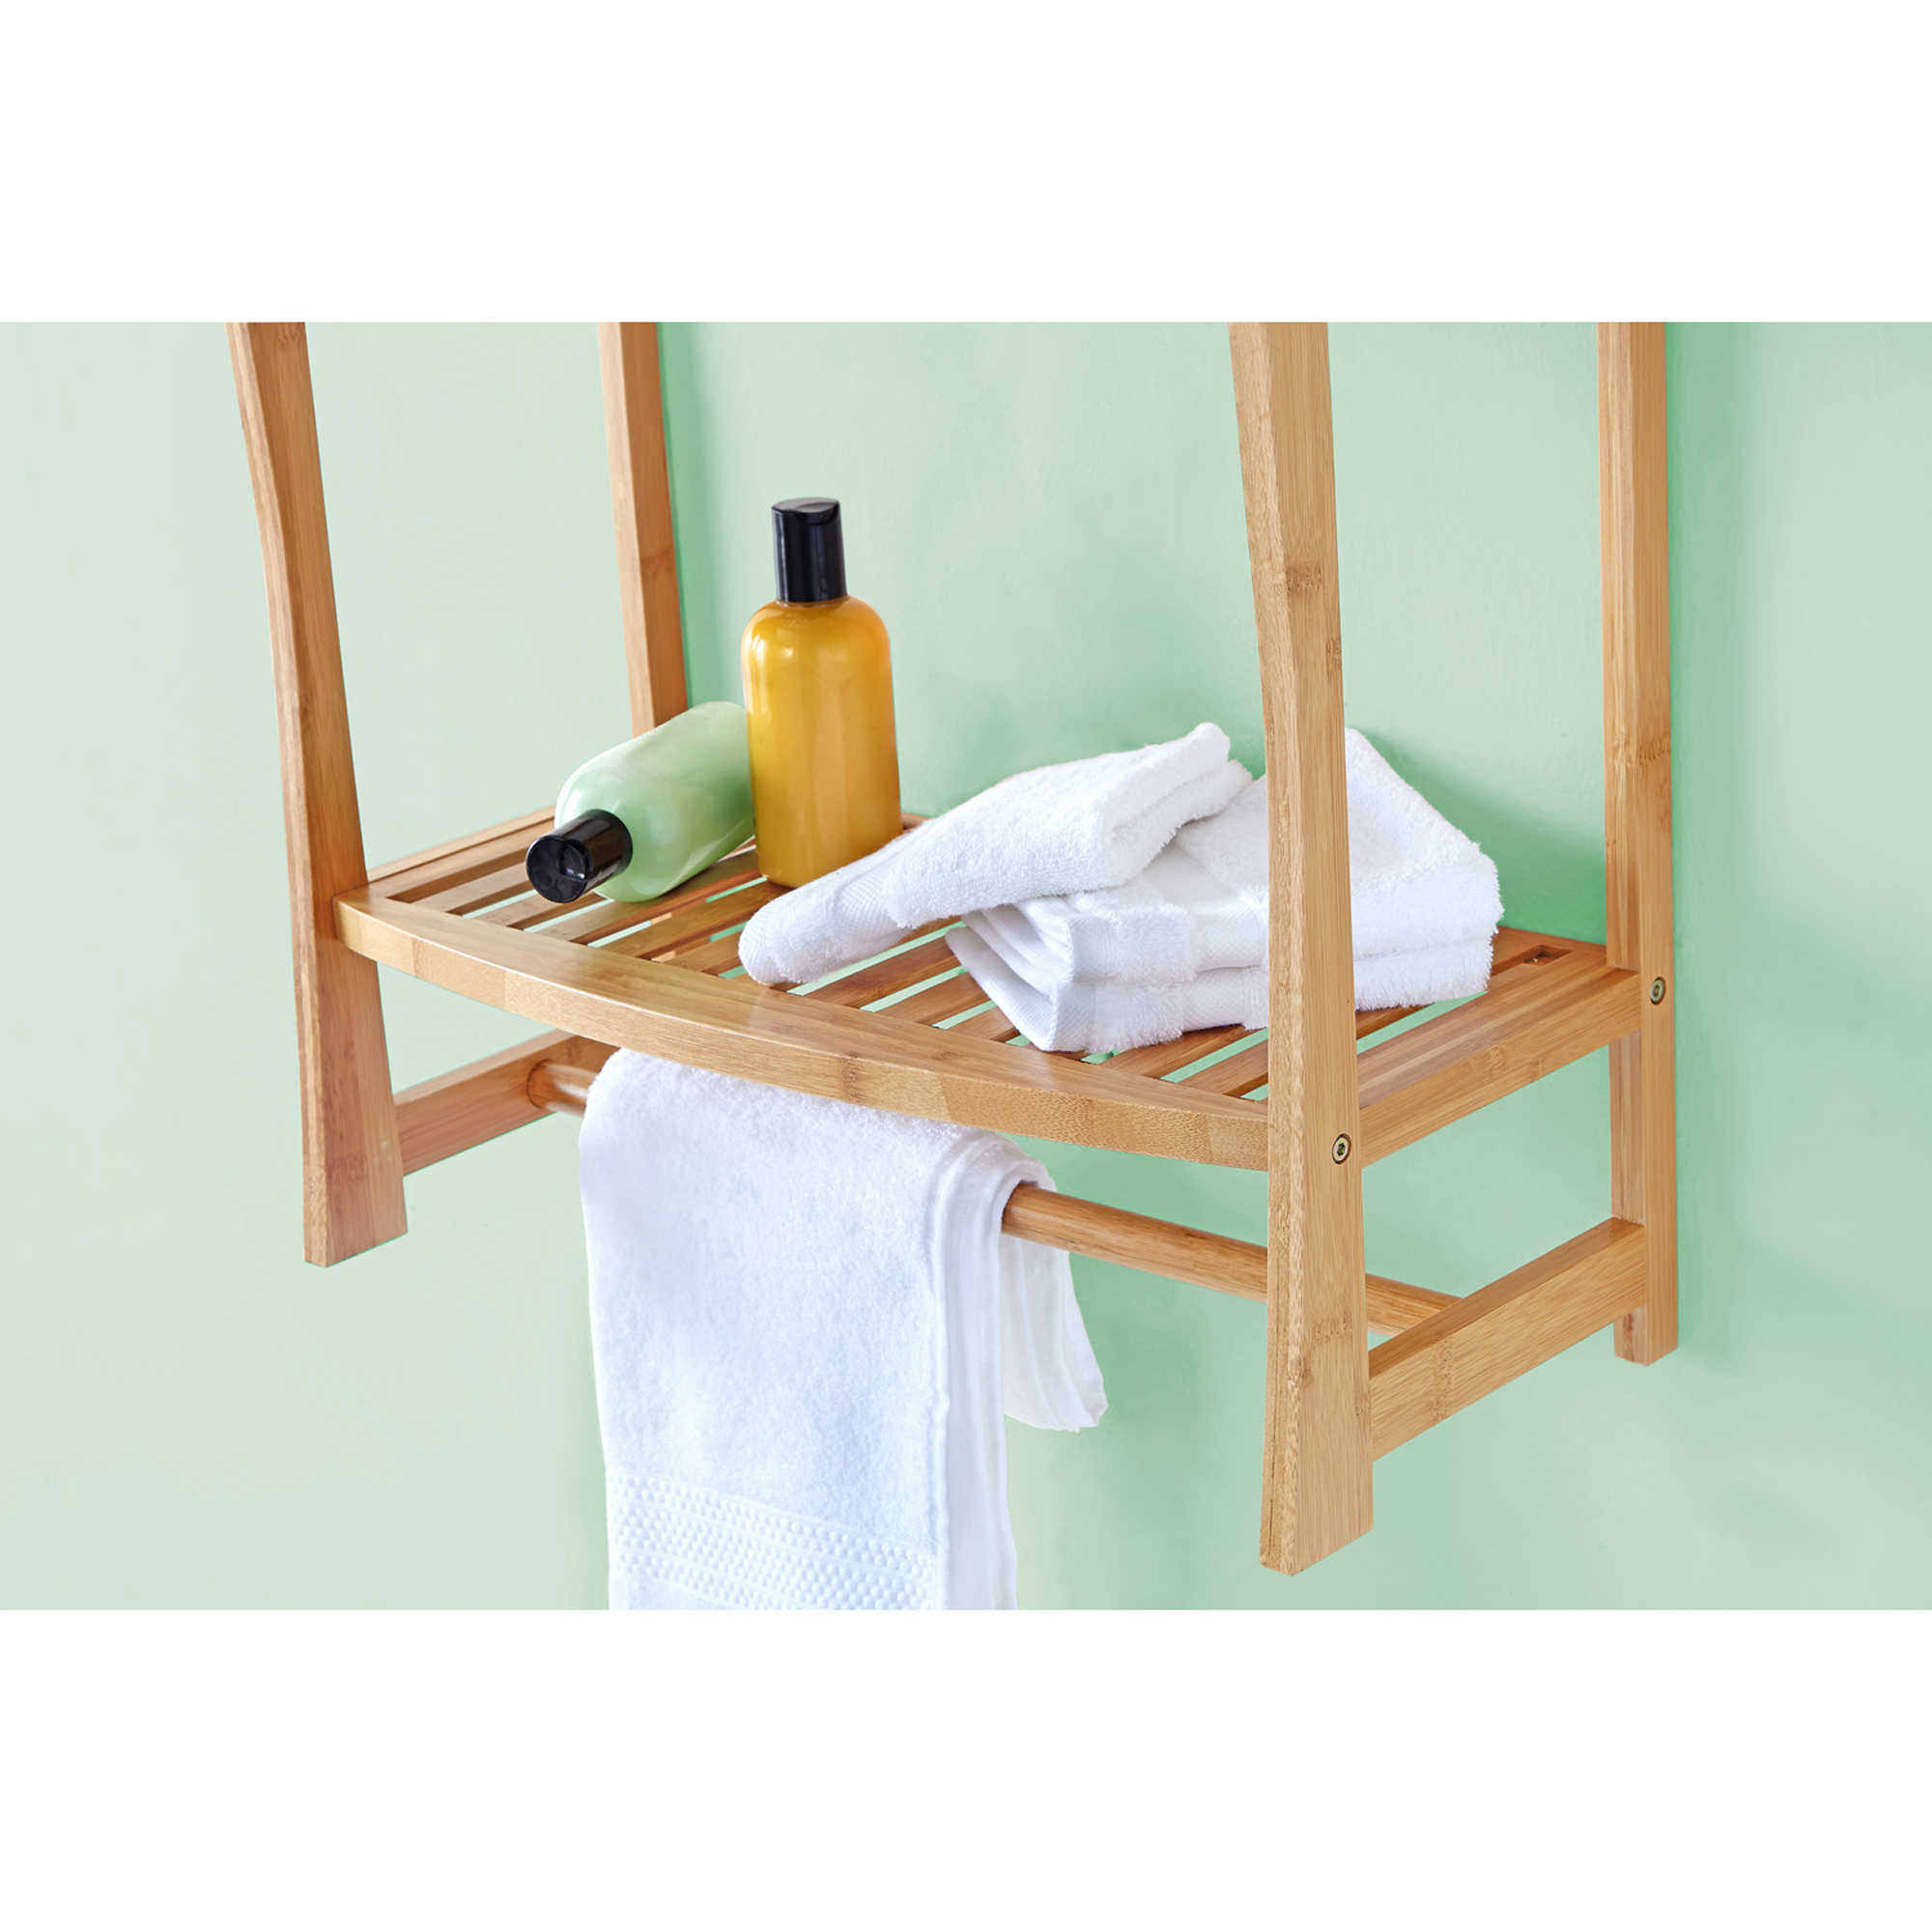 Shop Best Living Bamboo Bath Wall-mount Shelf with Towel Bar - N/A ...